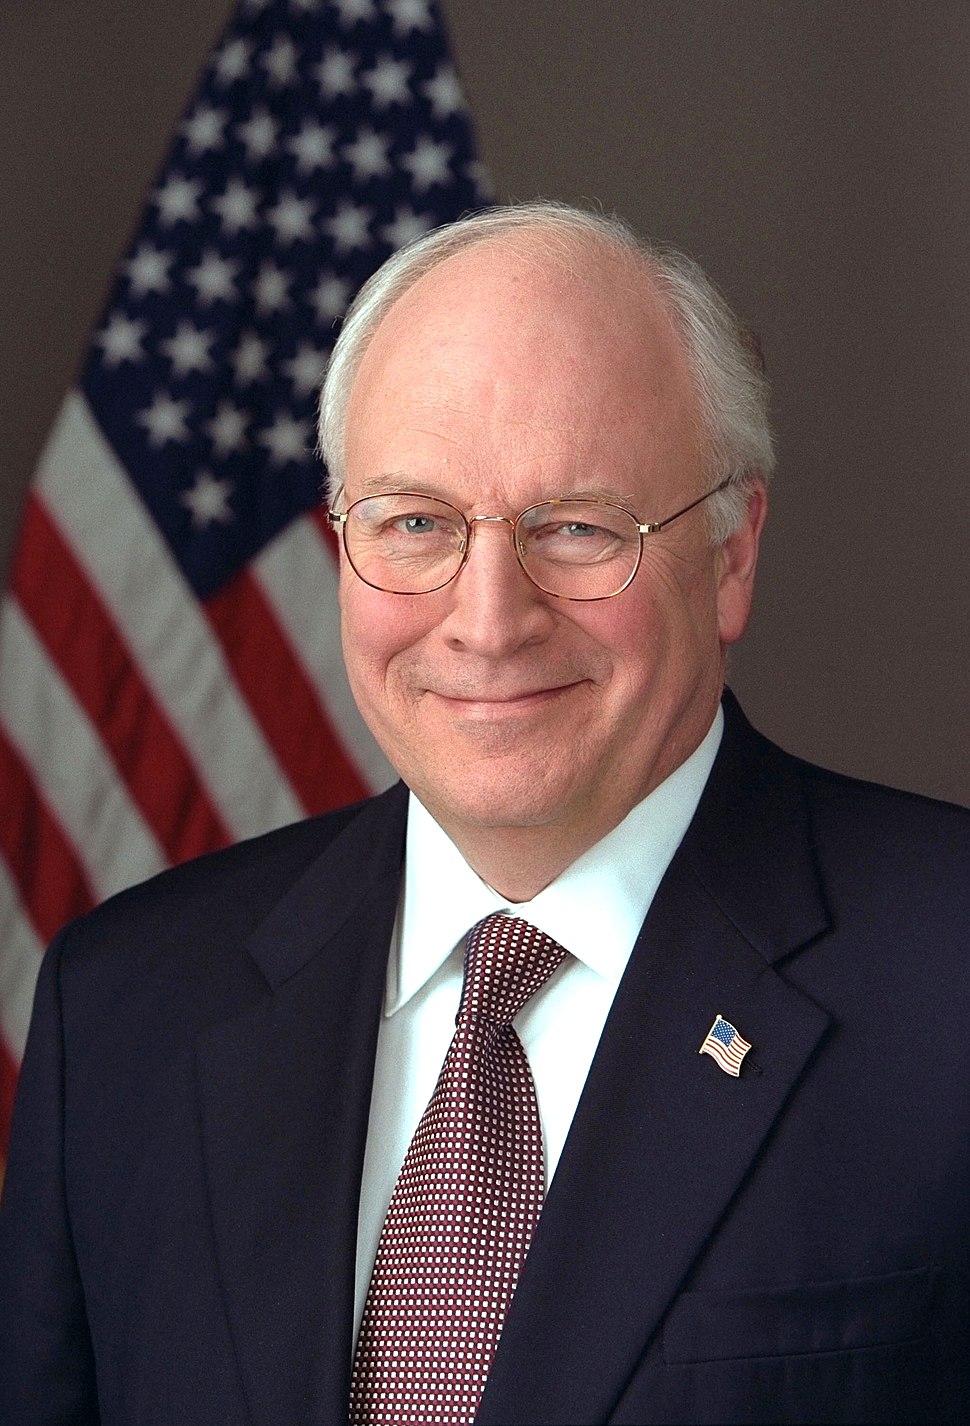 Richard Cheney 2005 official portrait